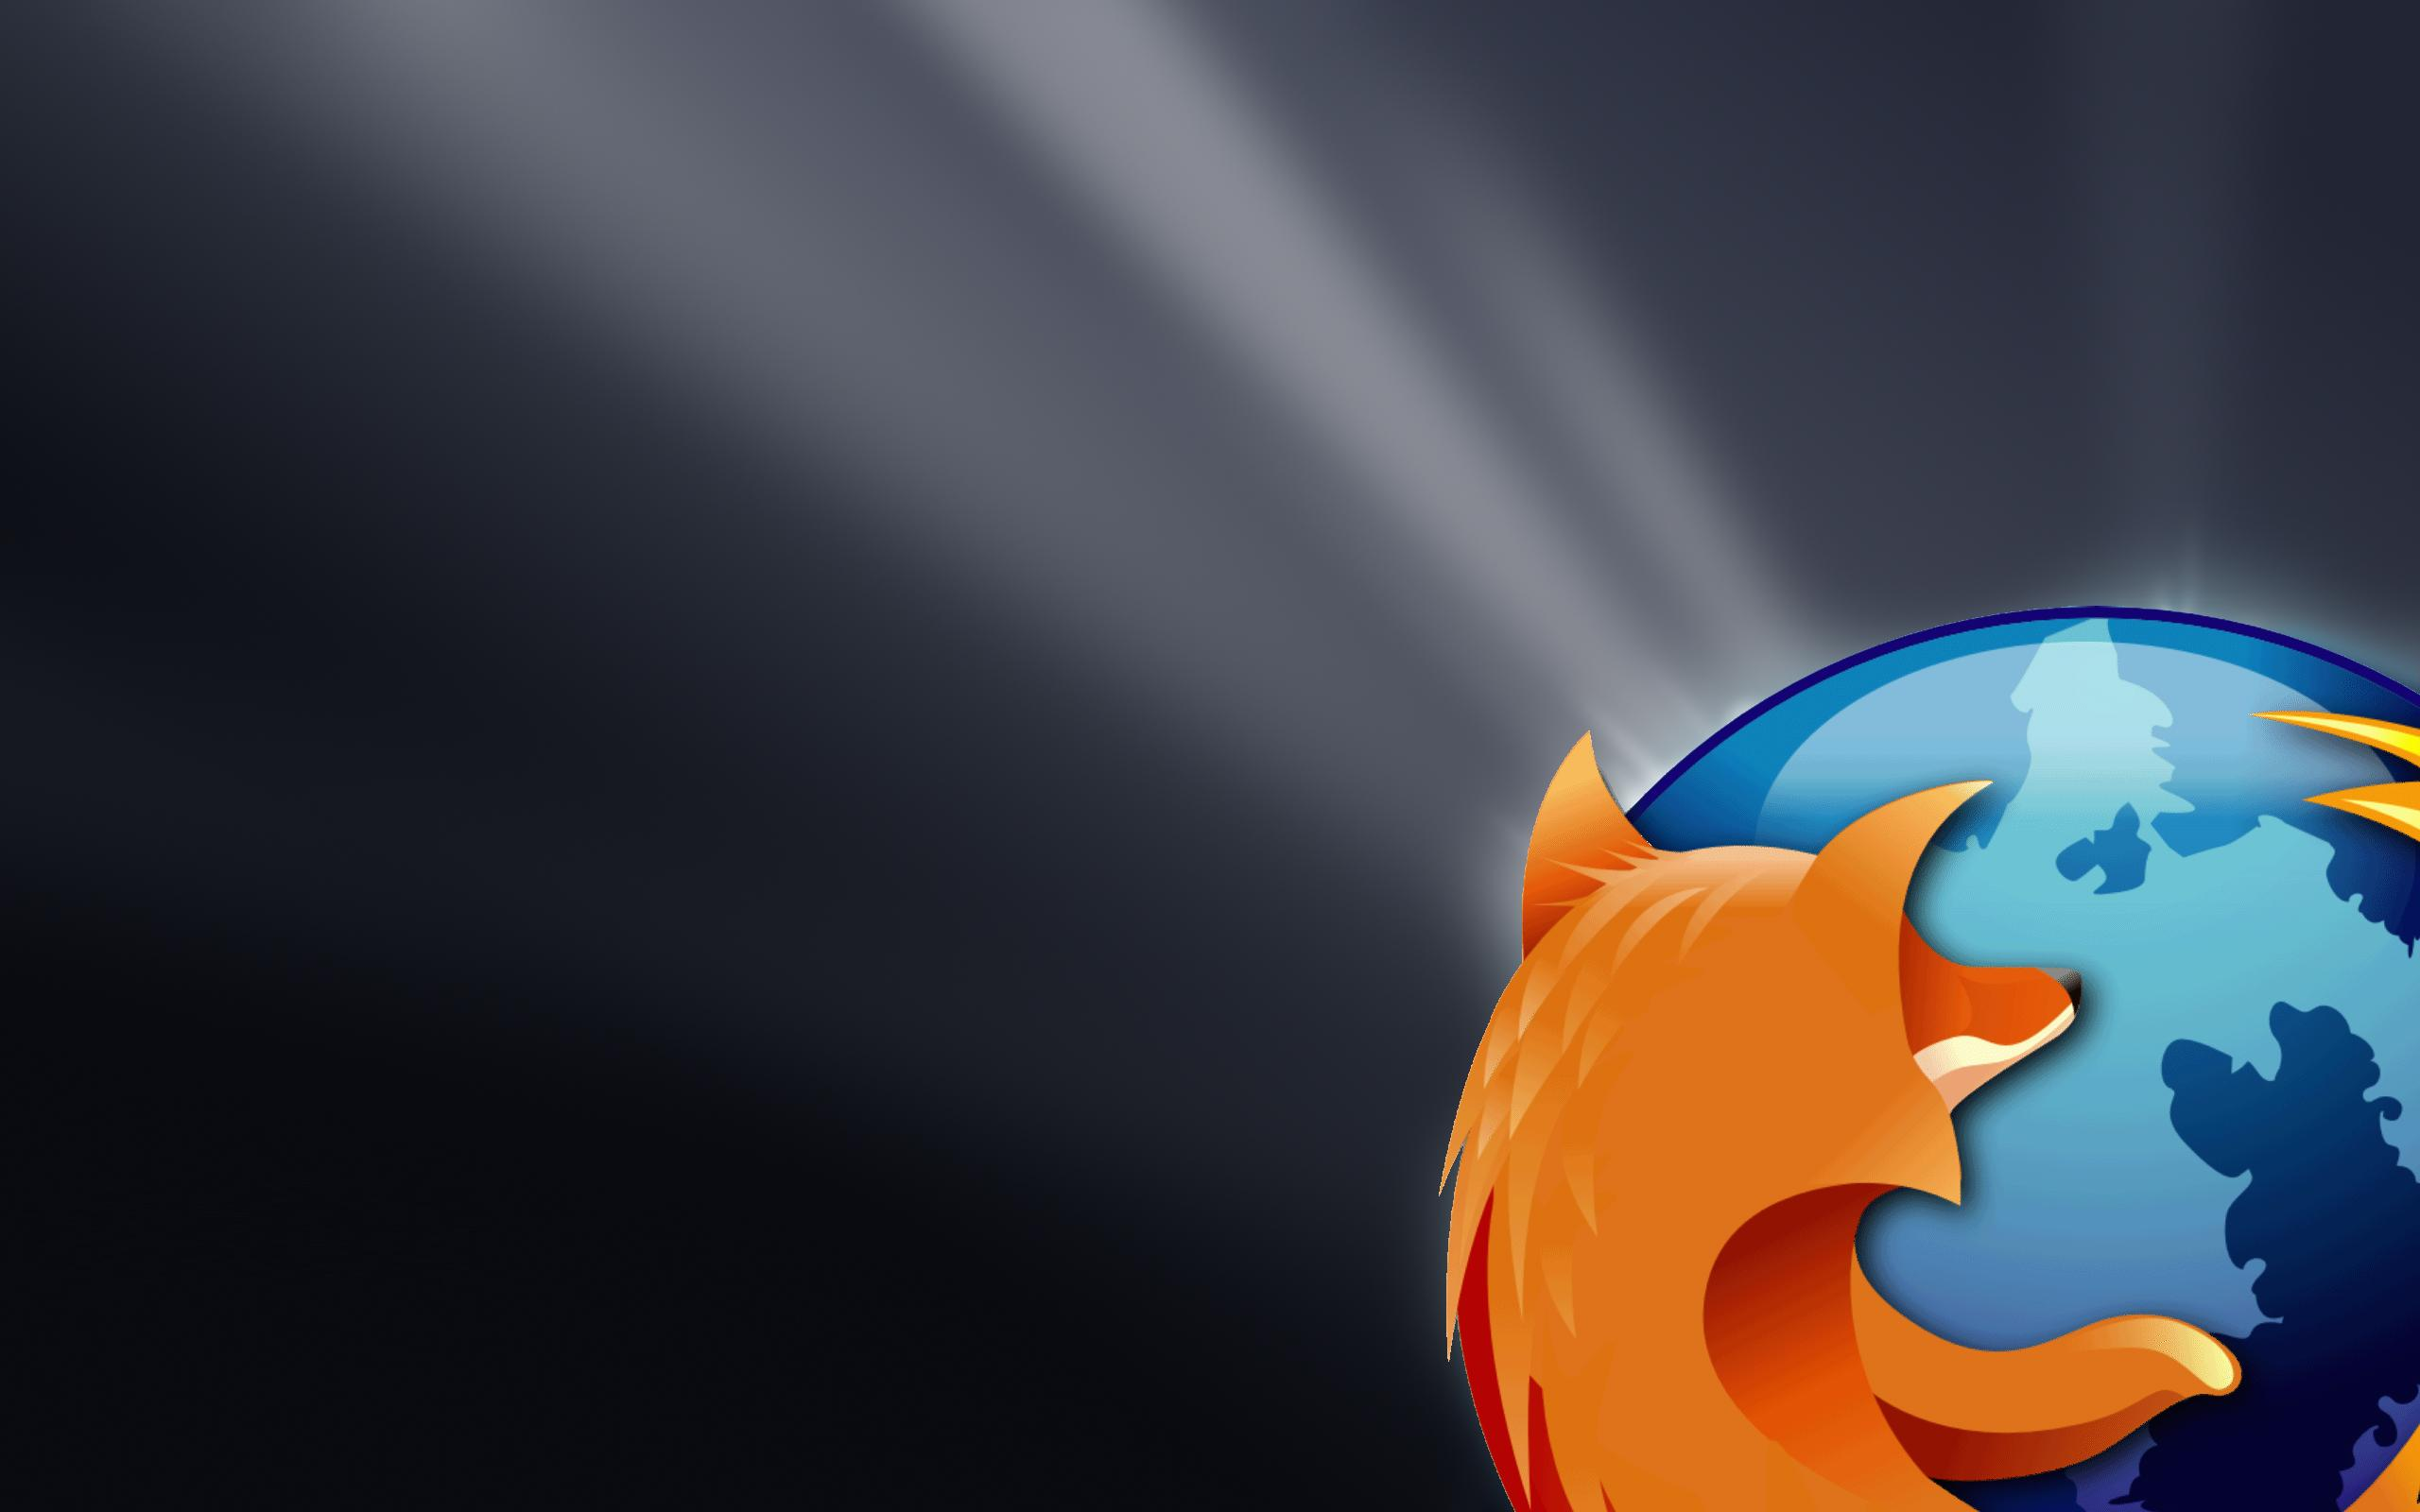 Mozilla Fire Fox 2020179 Hd Wallpaper Backgrounds Download